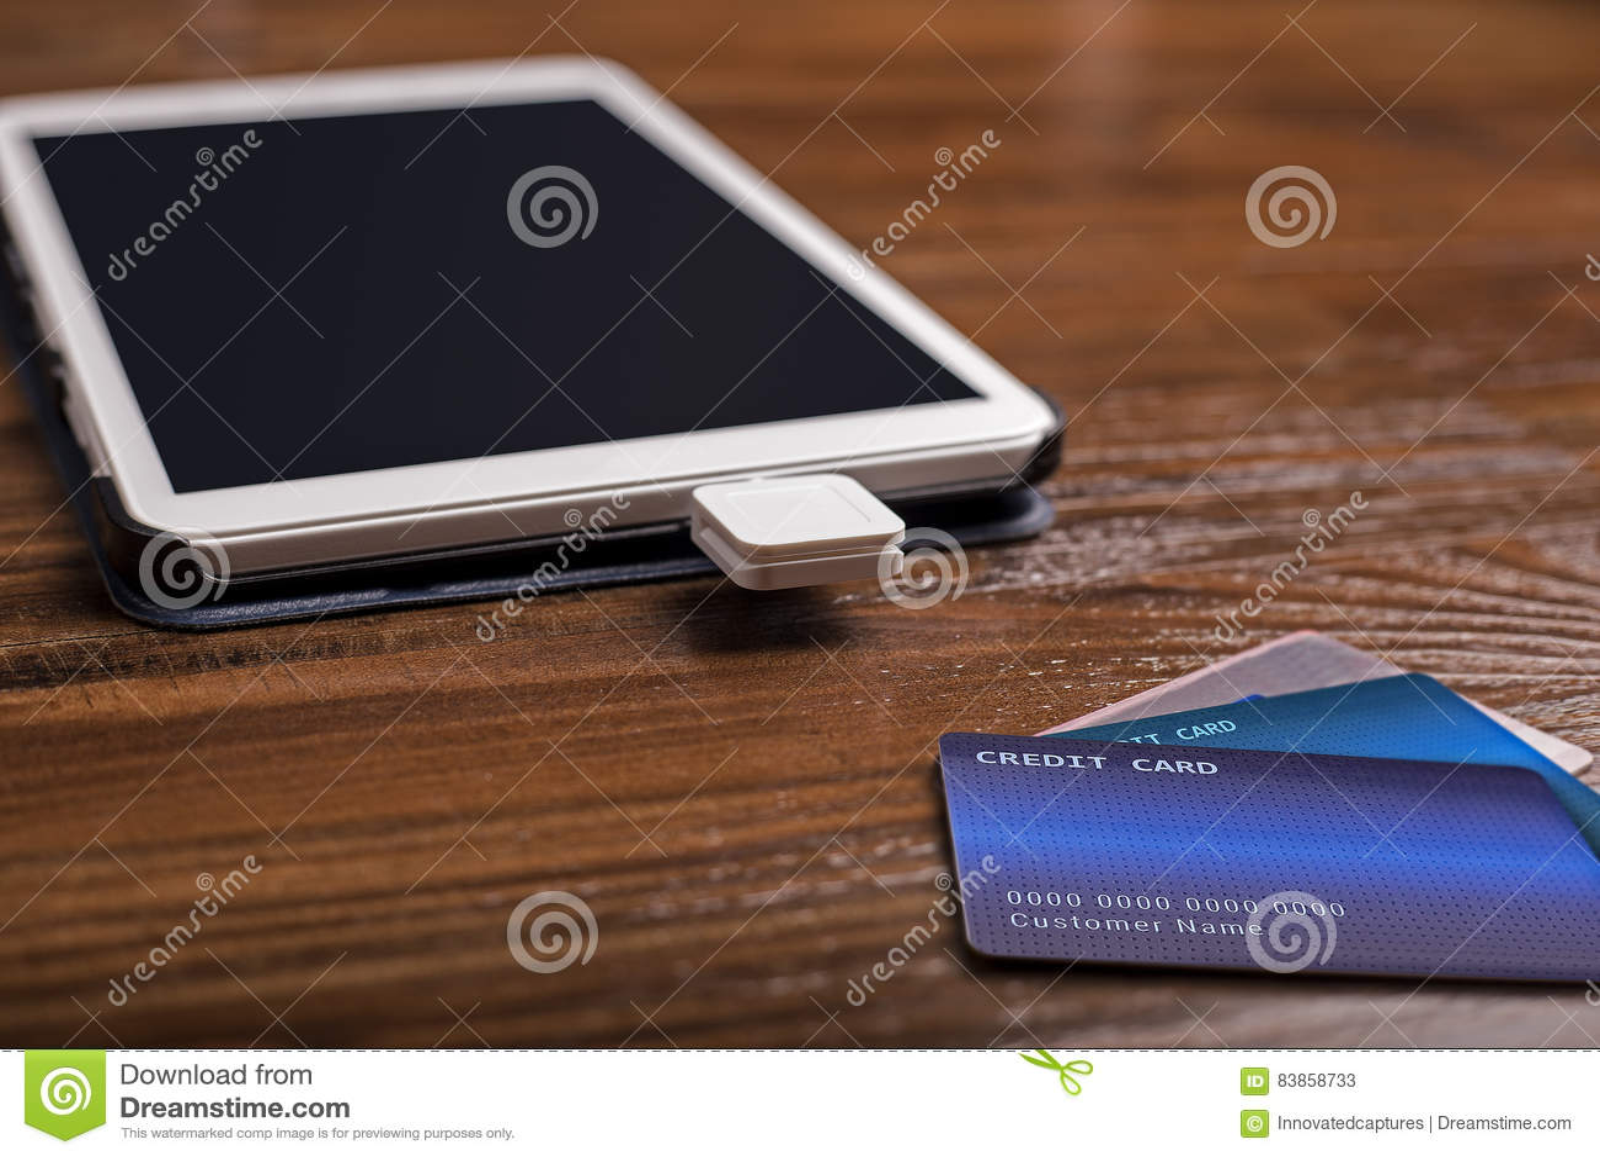 Credit Card Swipe Reader stock image. Image of machine ...